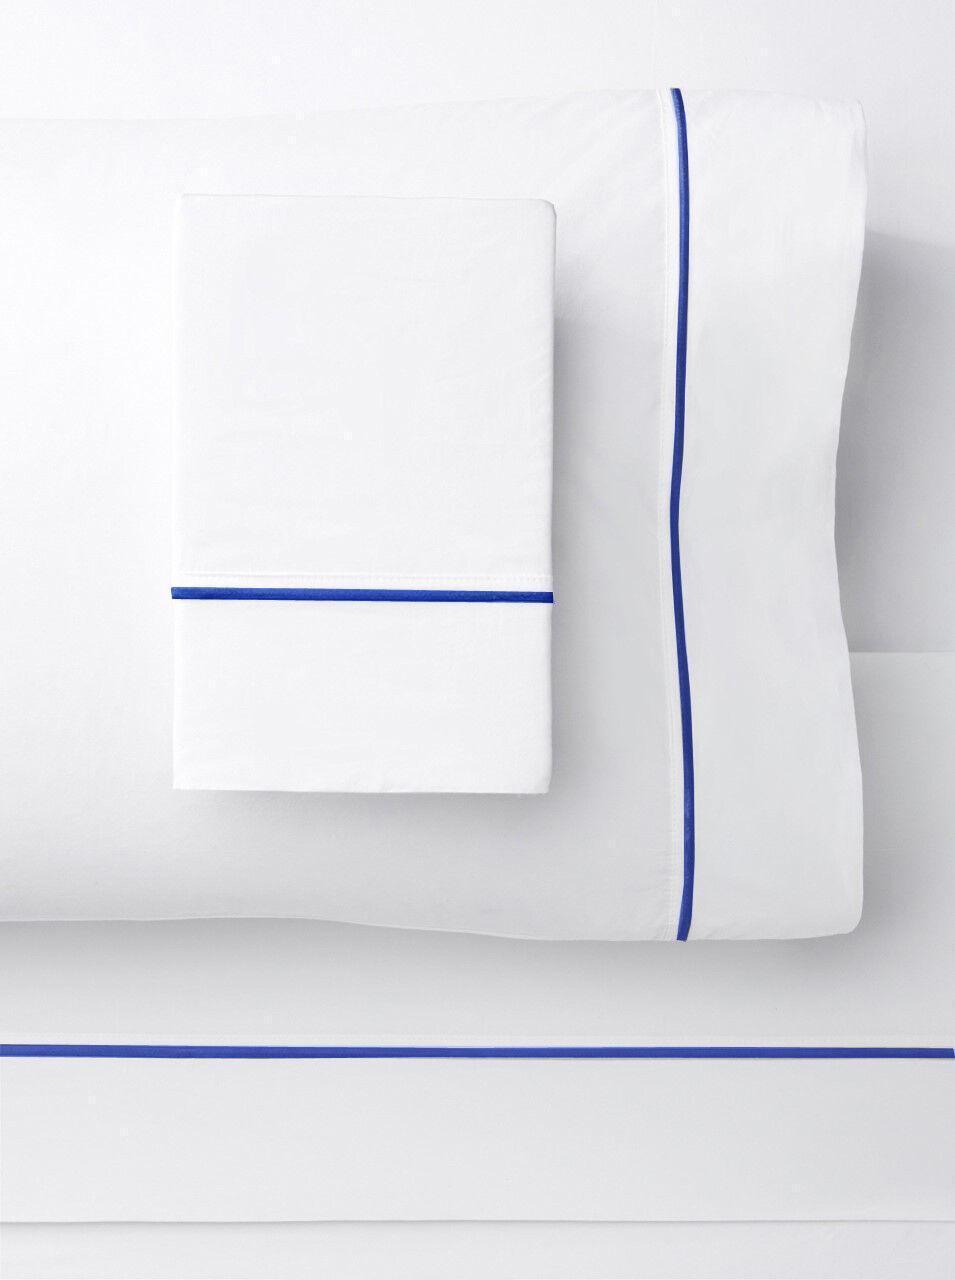 1000 Thread Count Single Stripe Embroidery Sheet Set Weiß on Blau